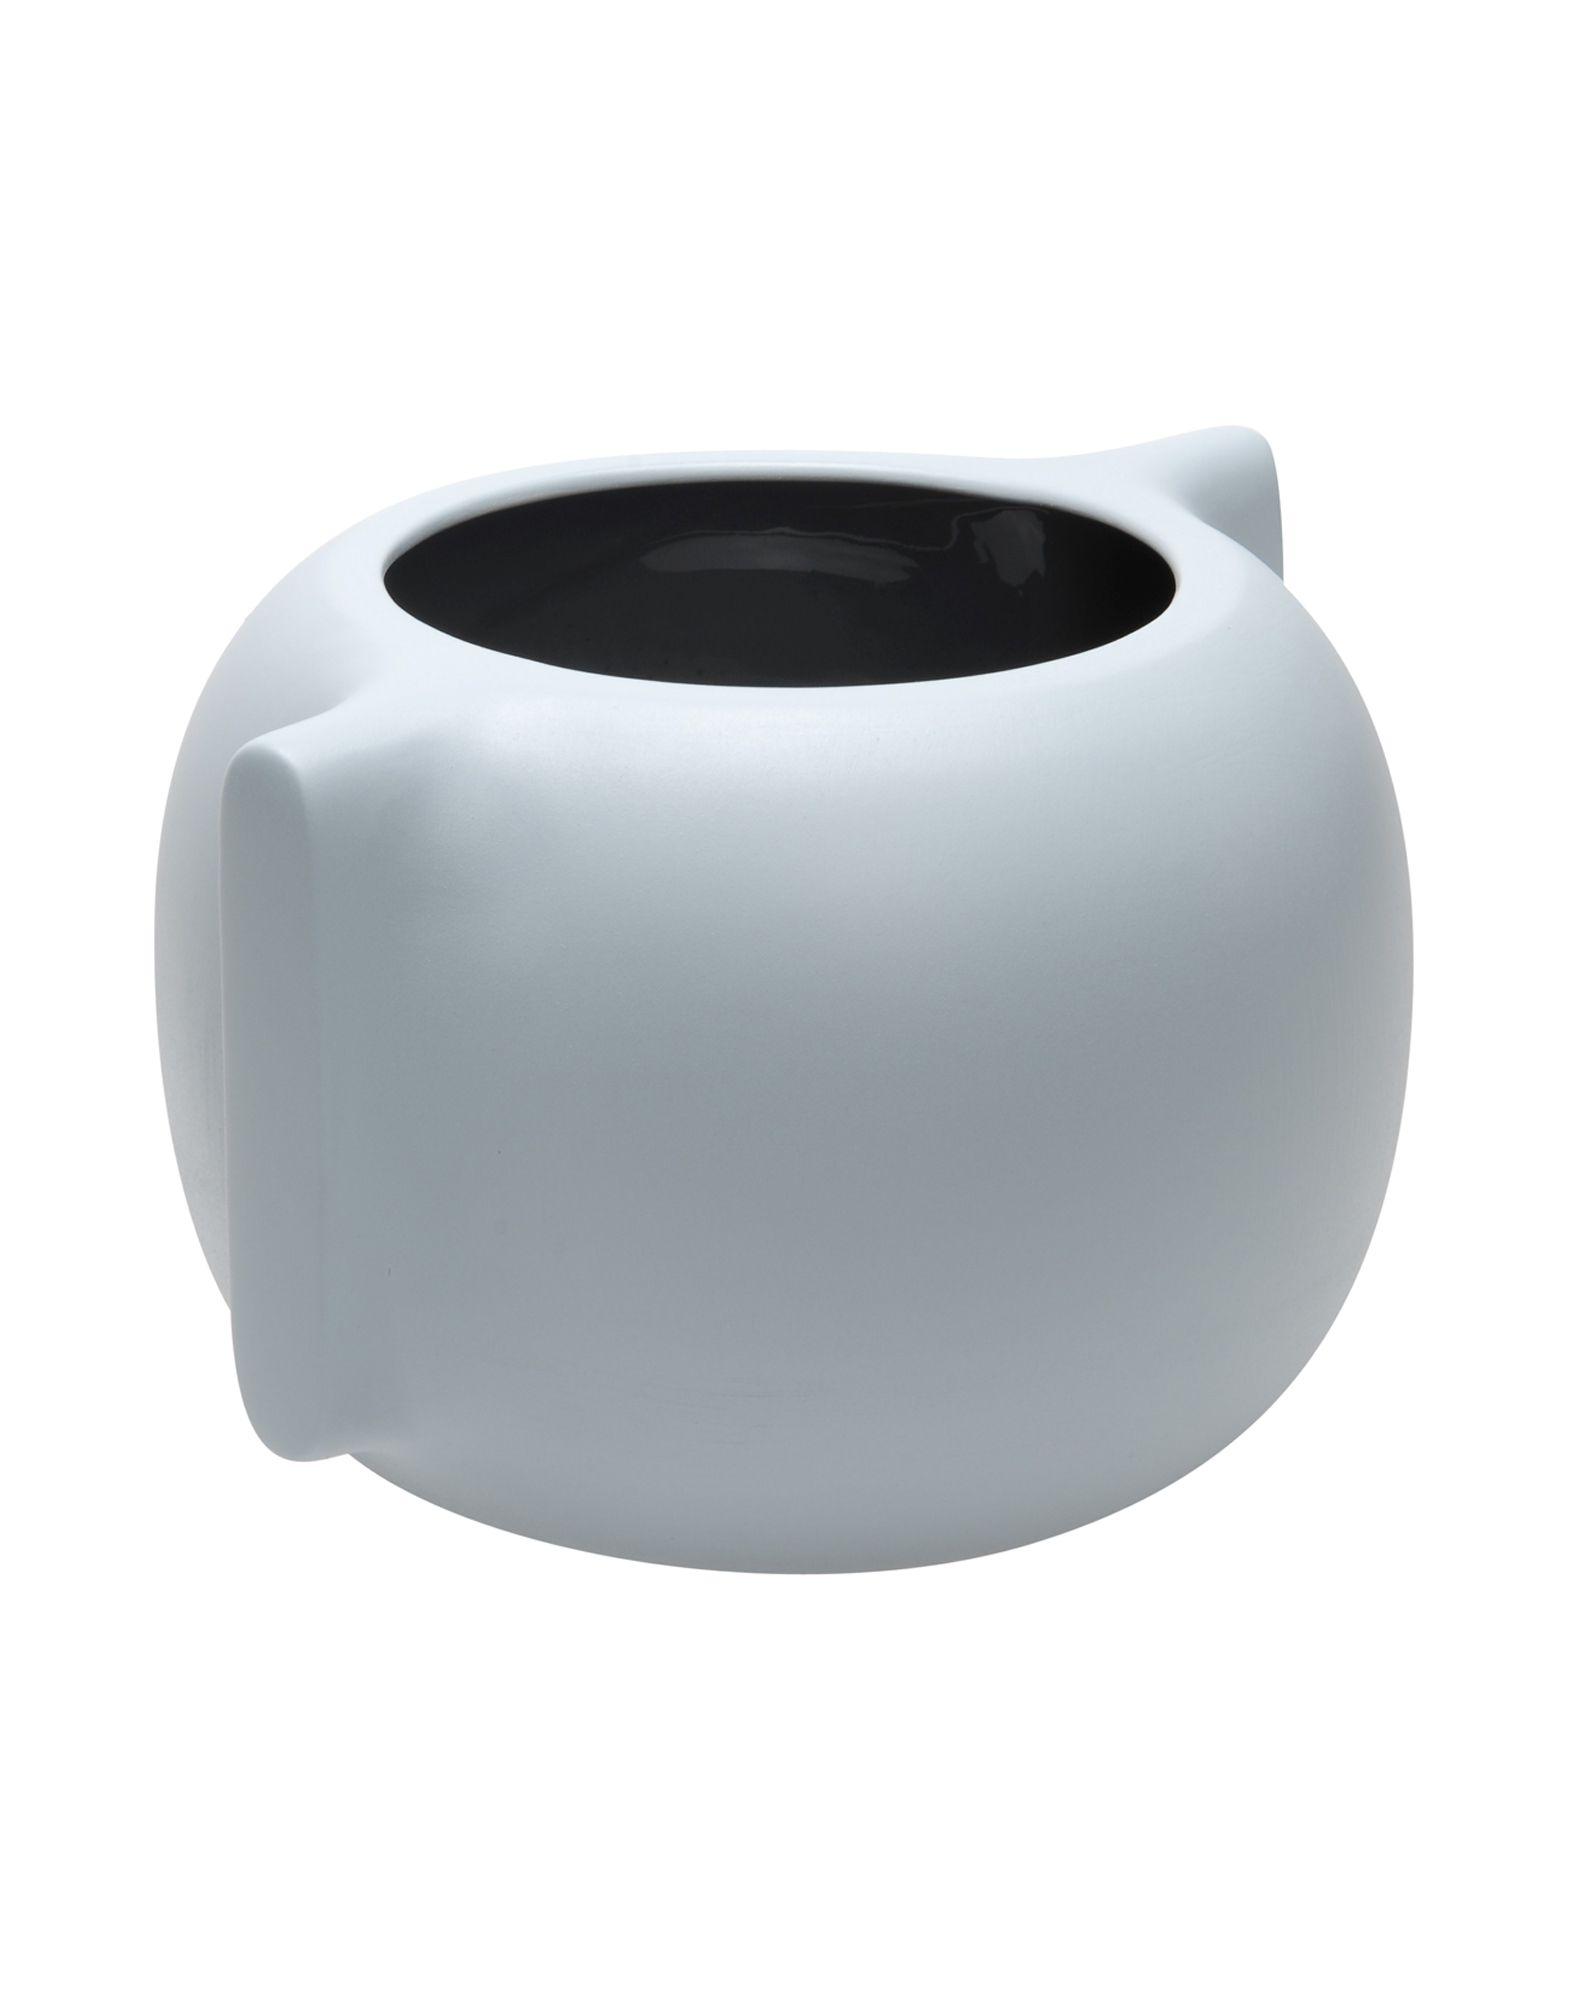 Incipit incipit complementi d 39 arredo vasi on yoox for Vasi complementi d arredo